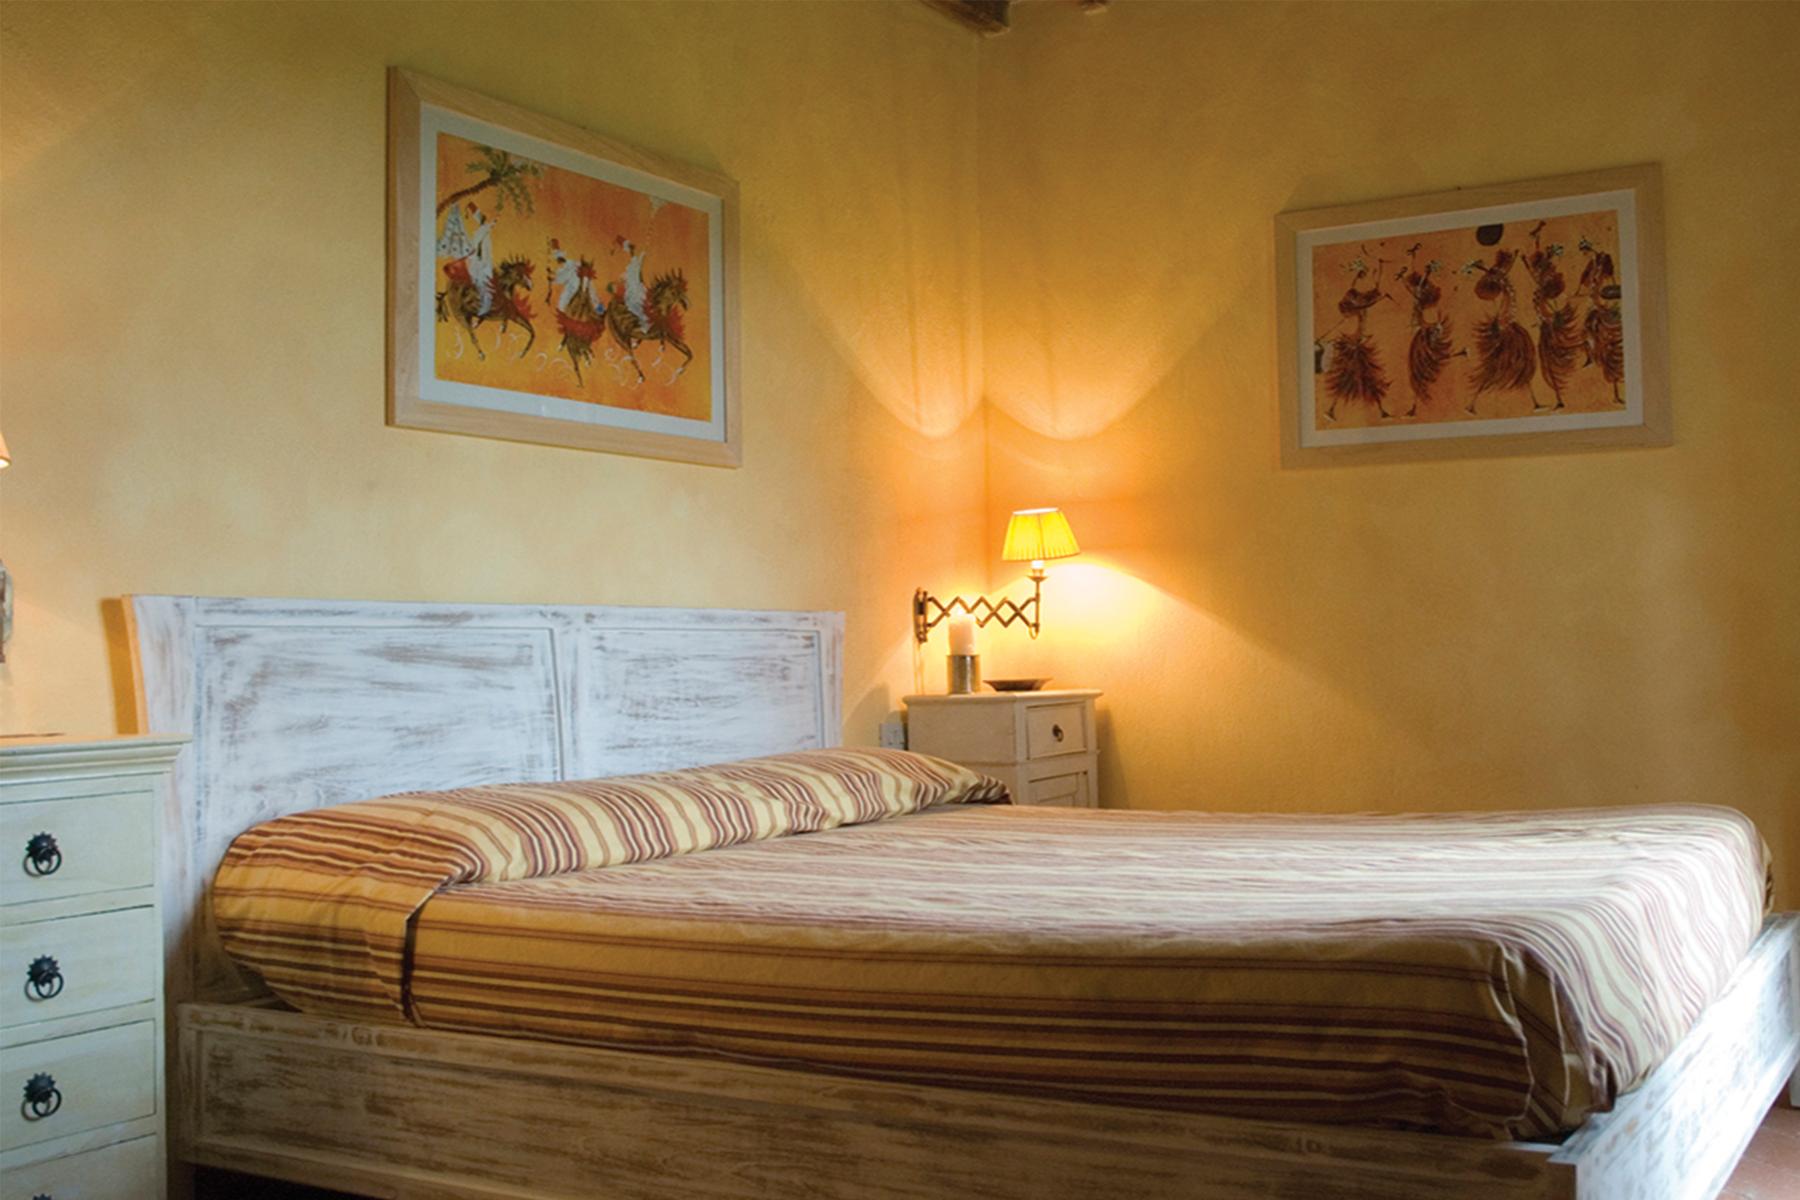 Casa indipendente in Vendita a Massarosa: 5 locali, 350 mq - Foto 9